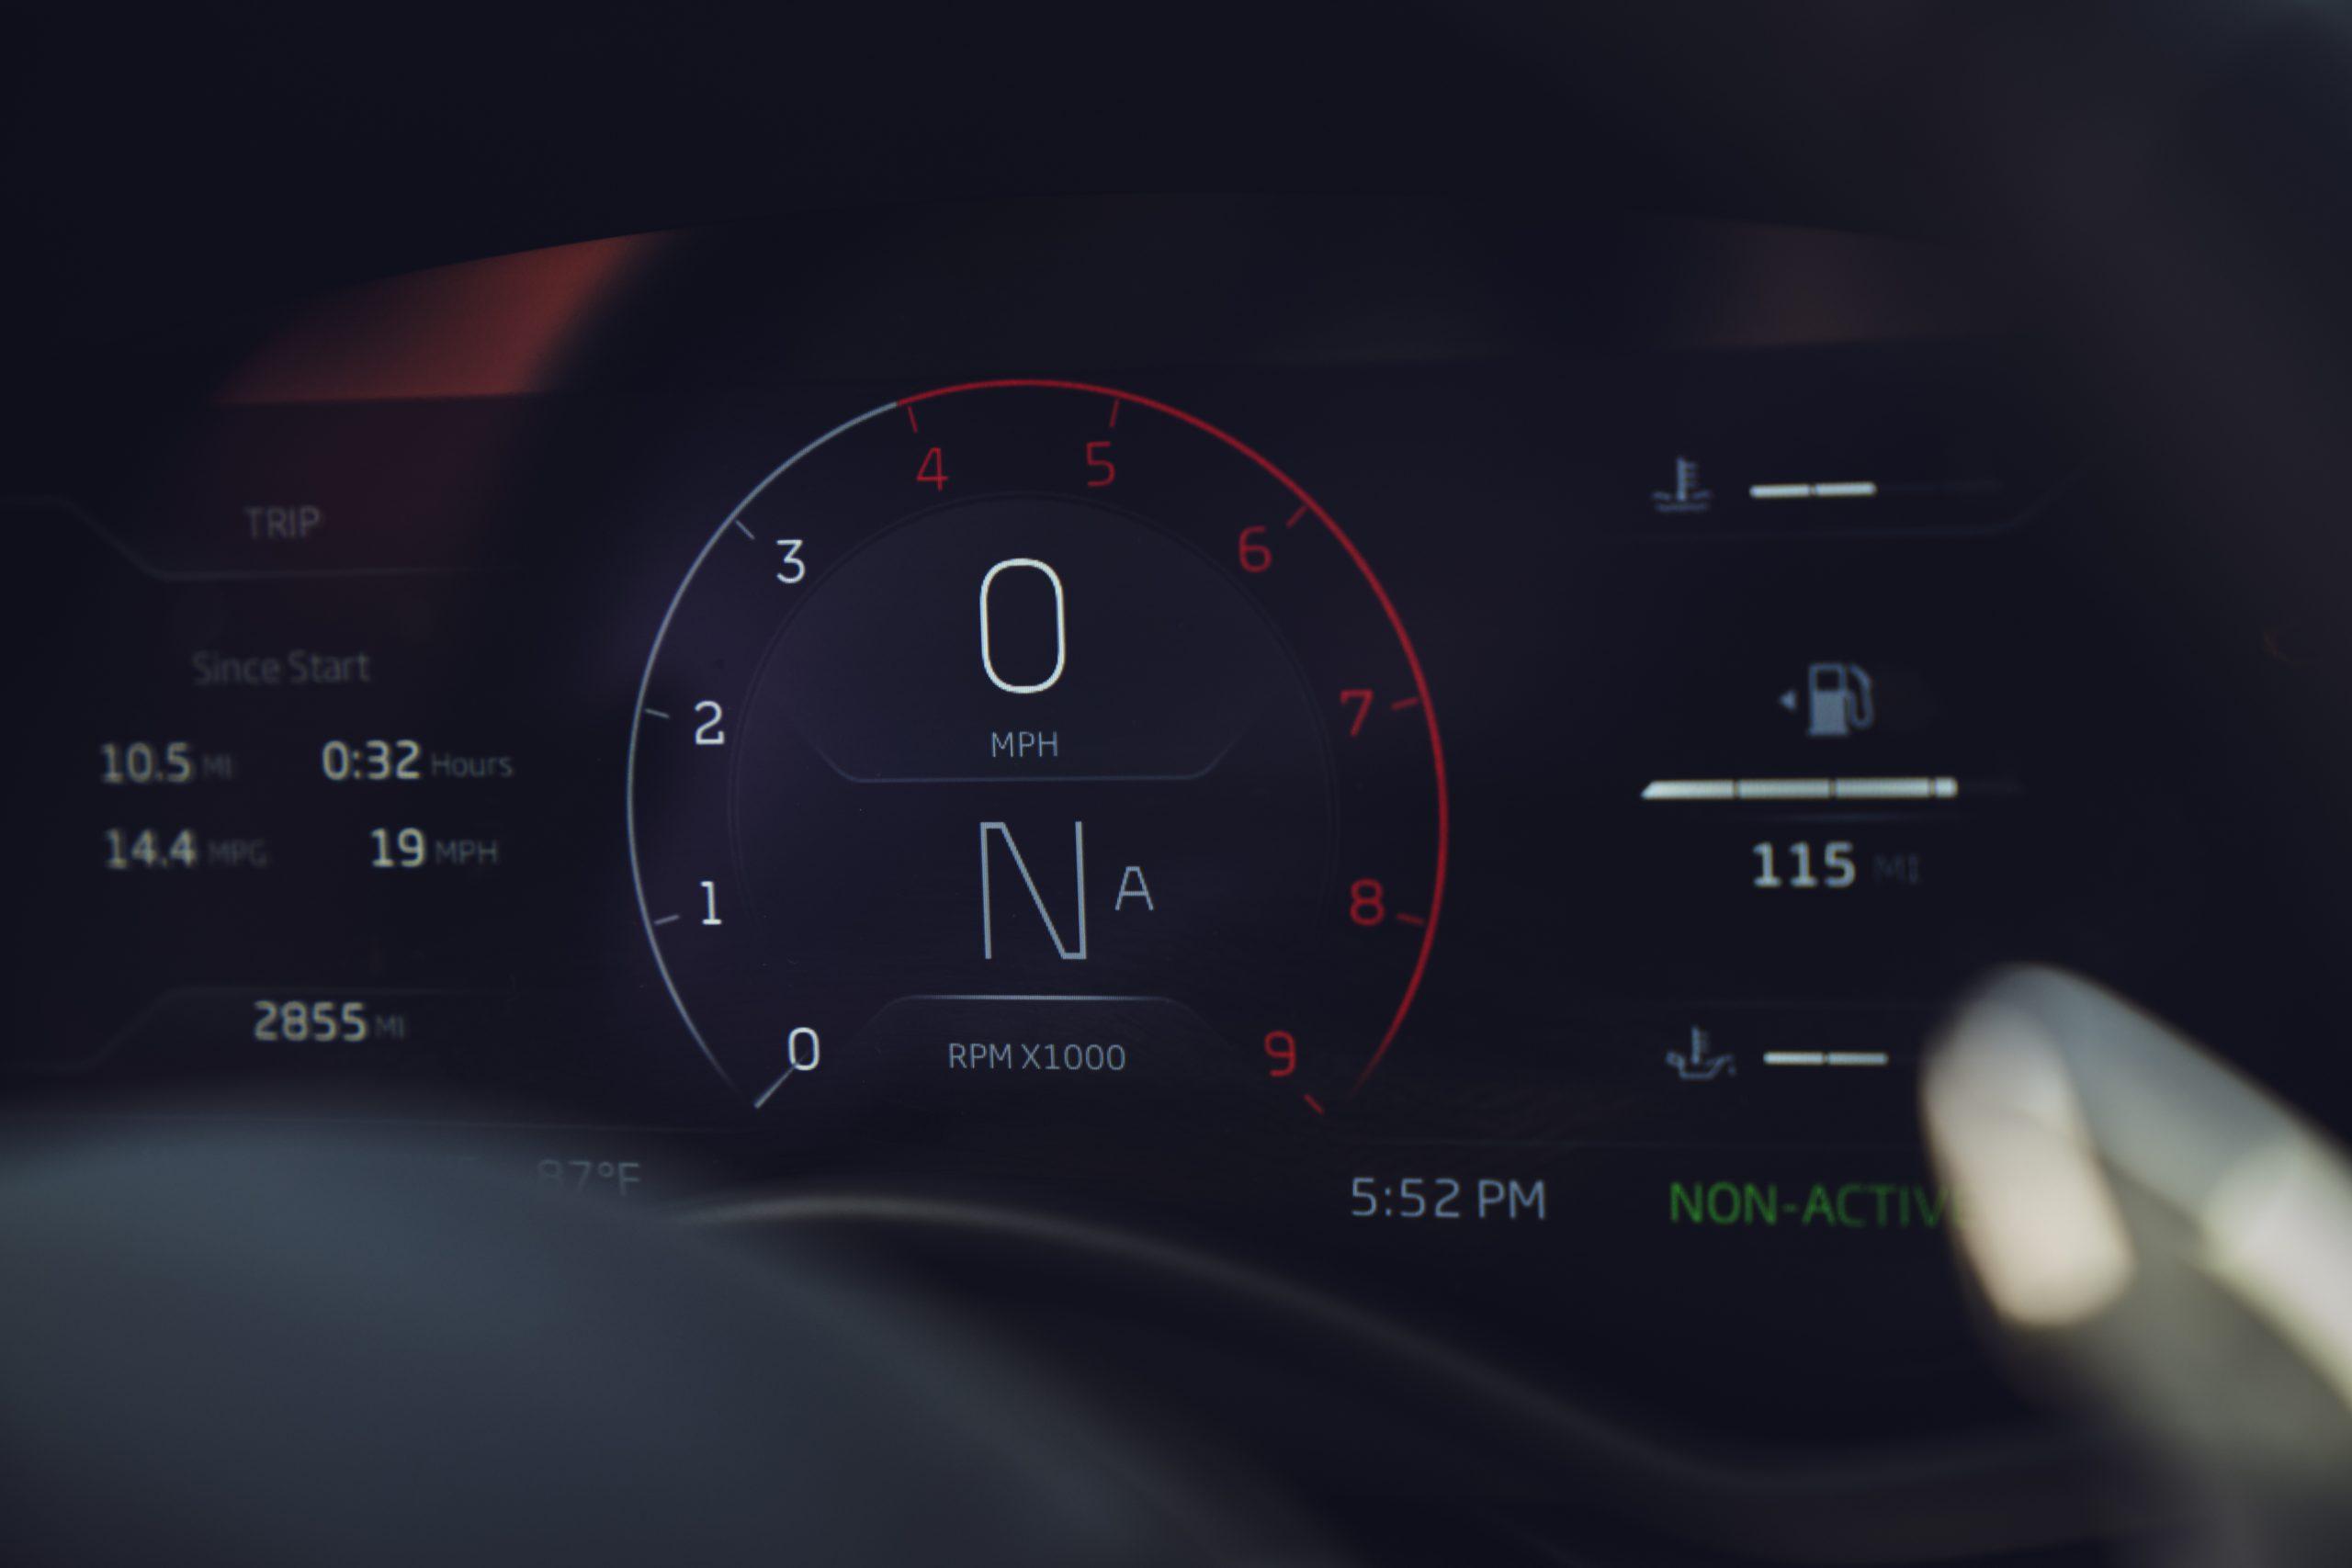 2020-McLaren-GT_Trahan_0523 gauges